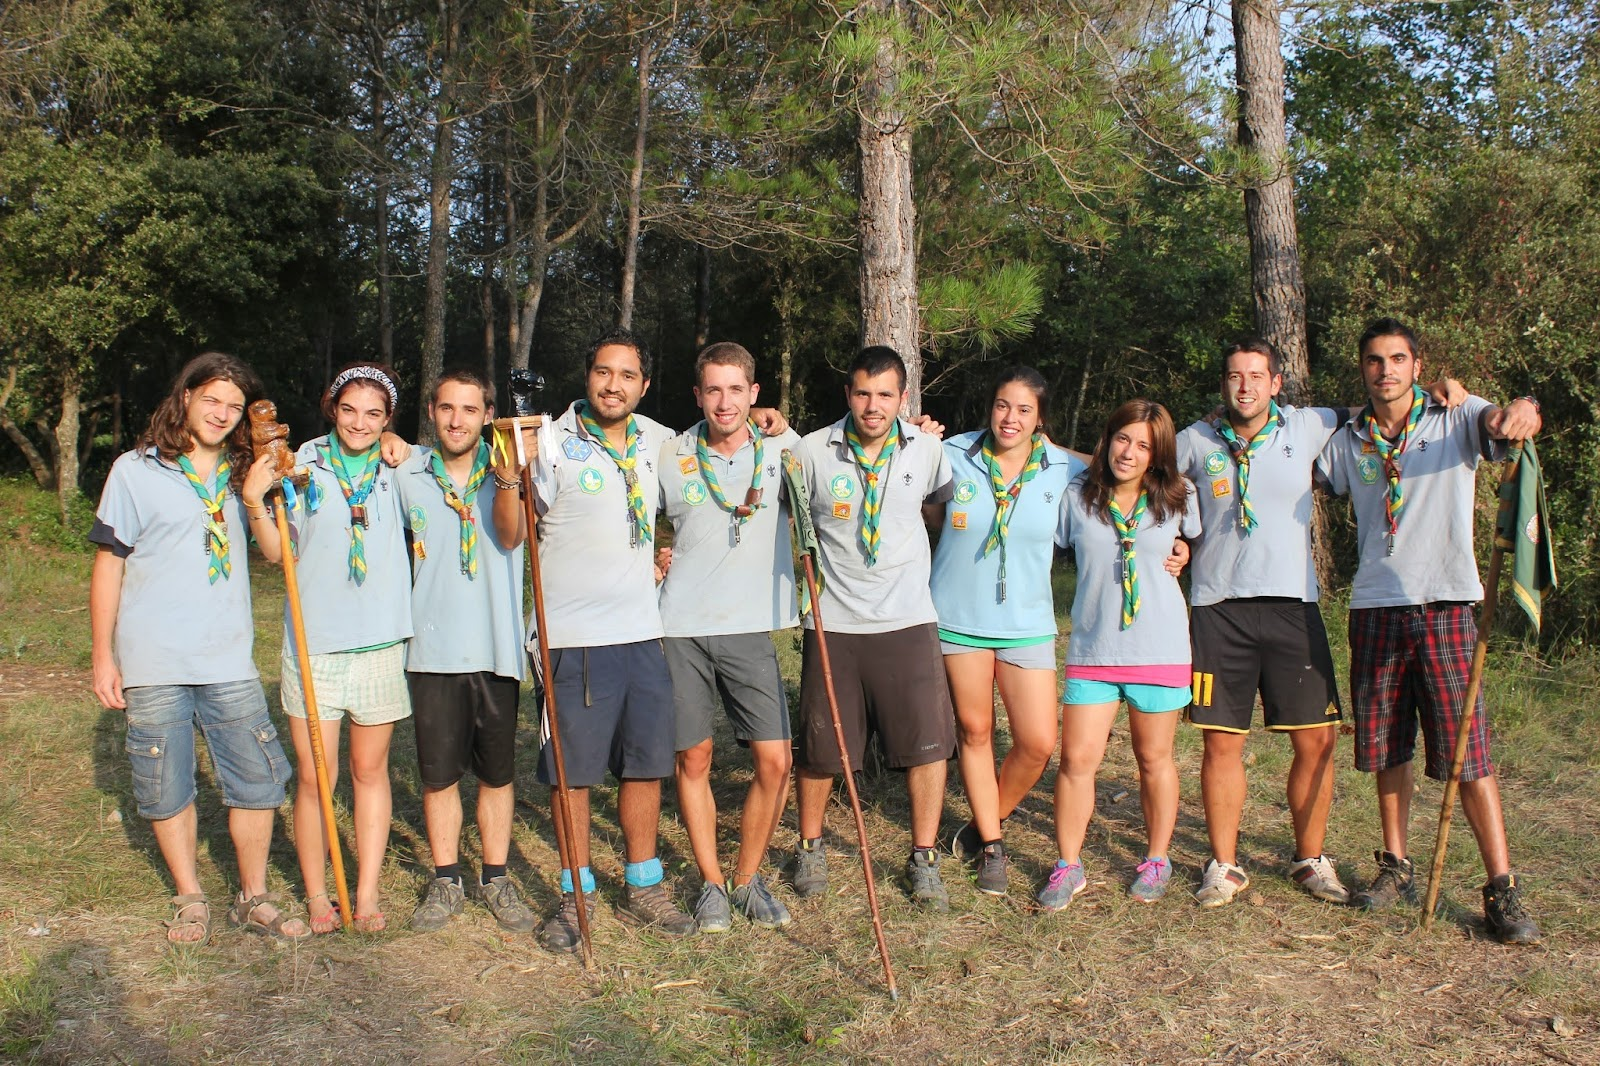 Campaments Estiu Cabanelles 2014 - IMG_0505-SMILE.jpg